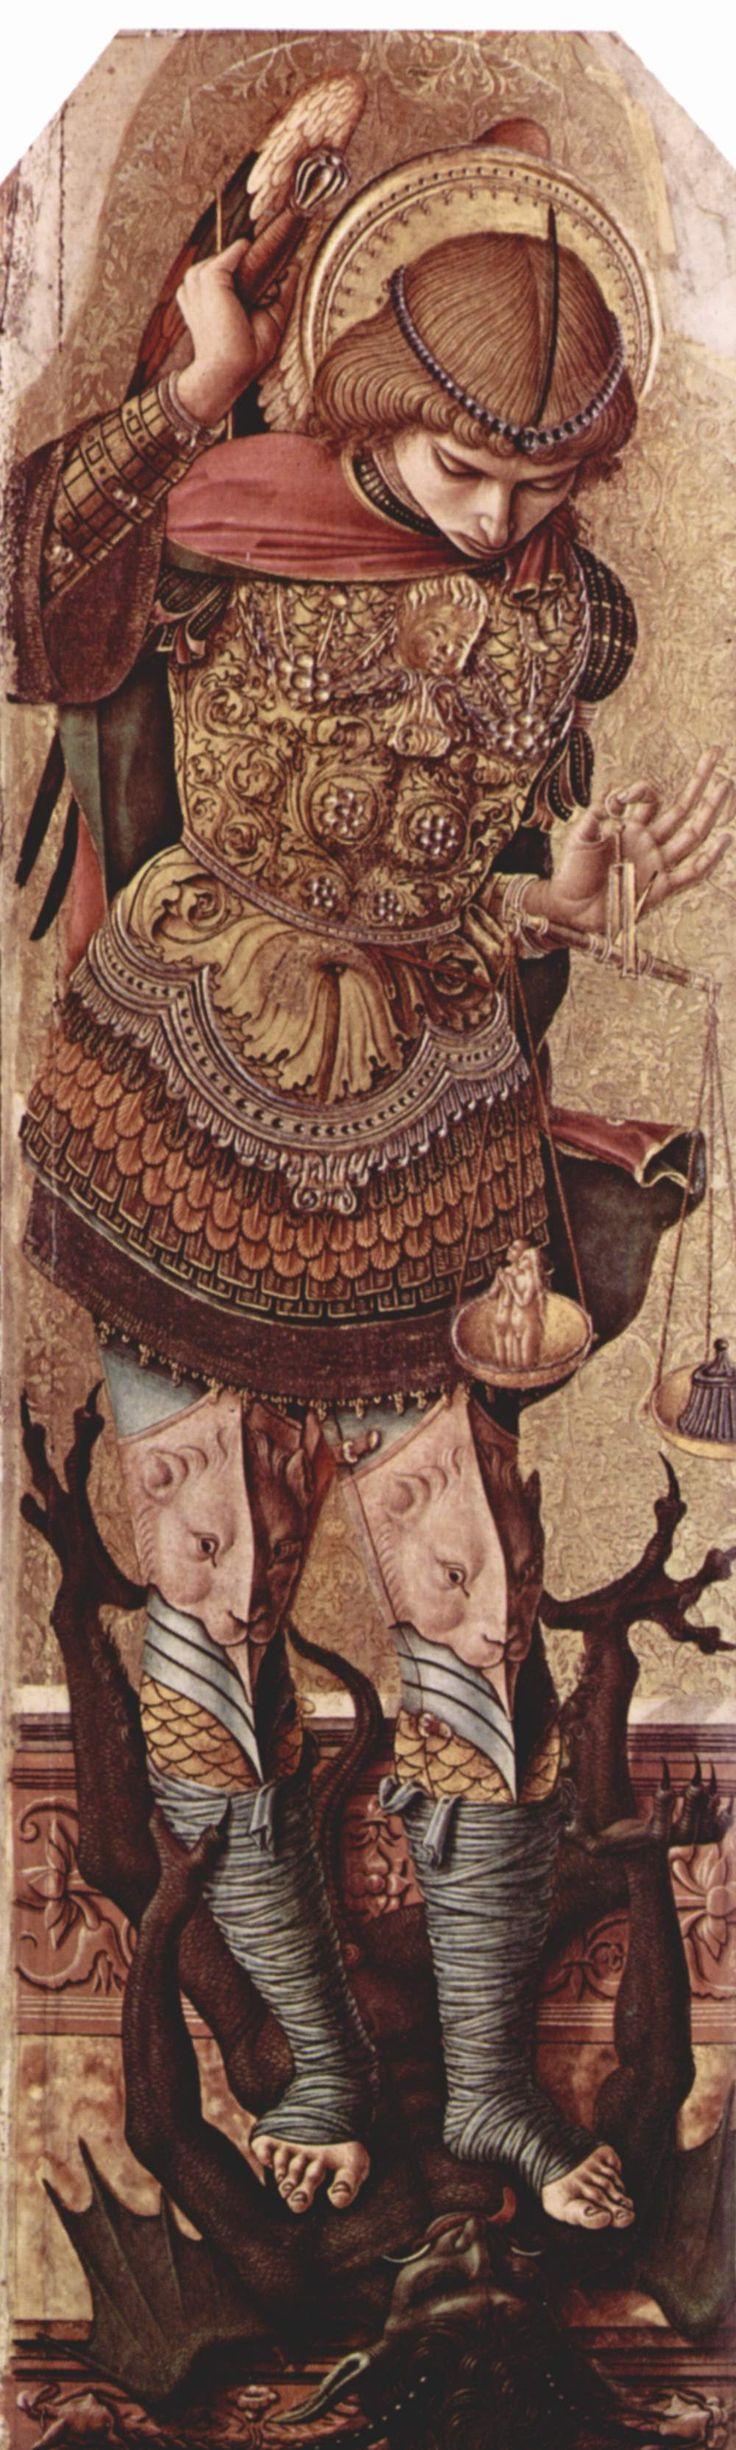 Saint Michael the Archangel - Patron Saint of England - Feast Day is September 29 (Carlo Crivelli's Saint Michael)